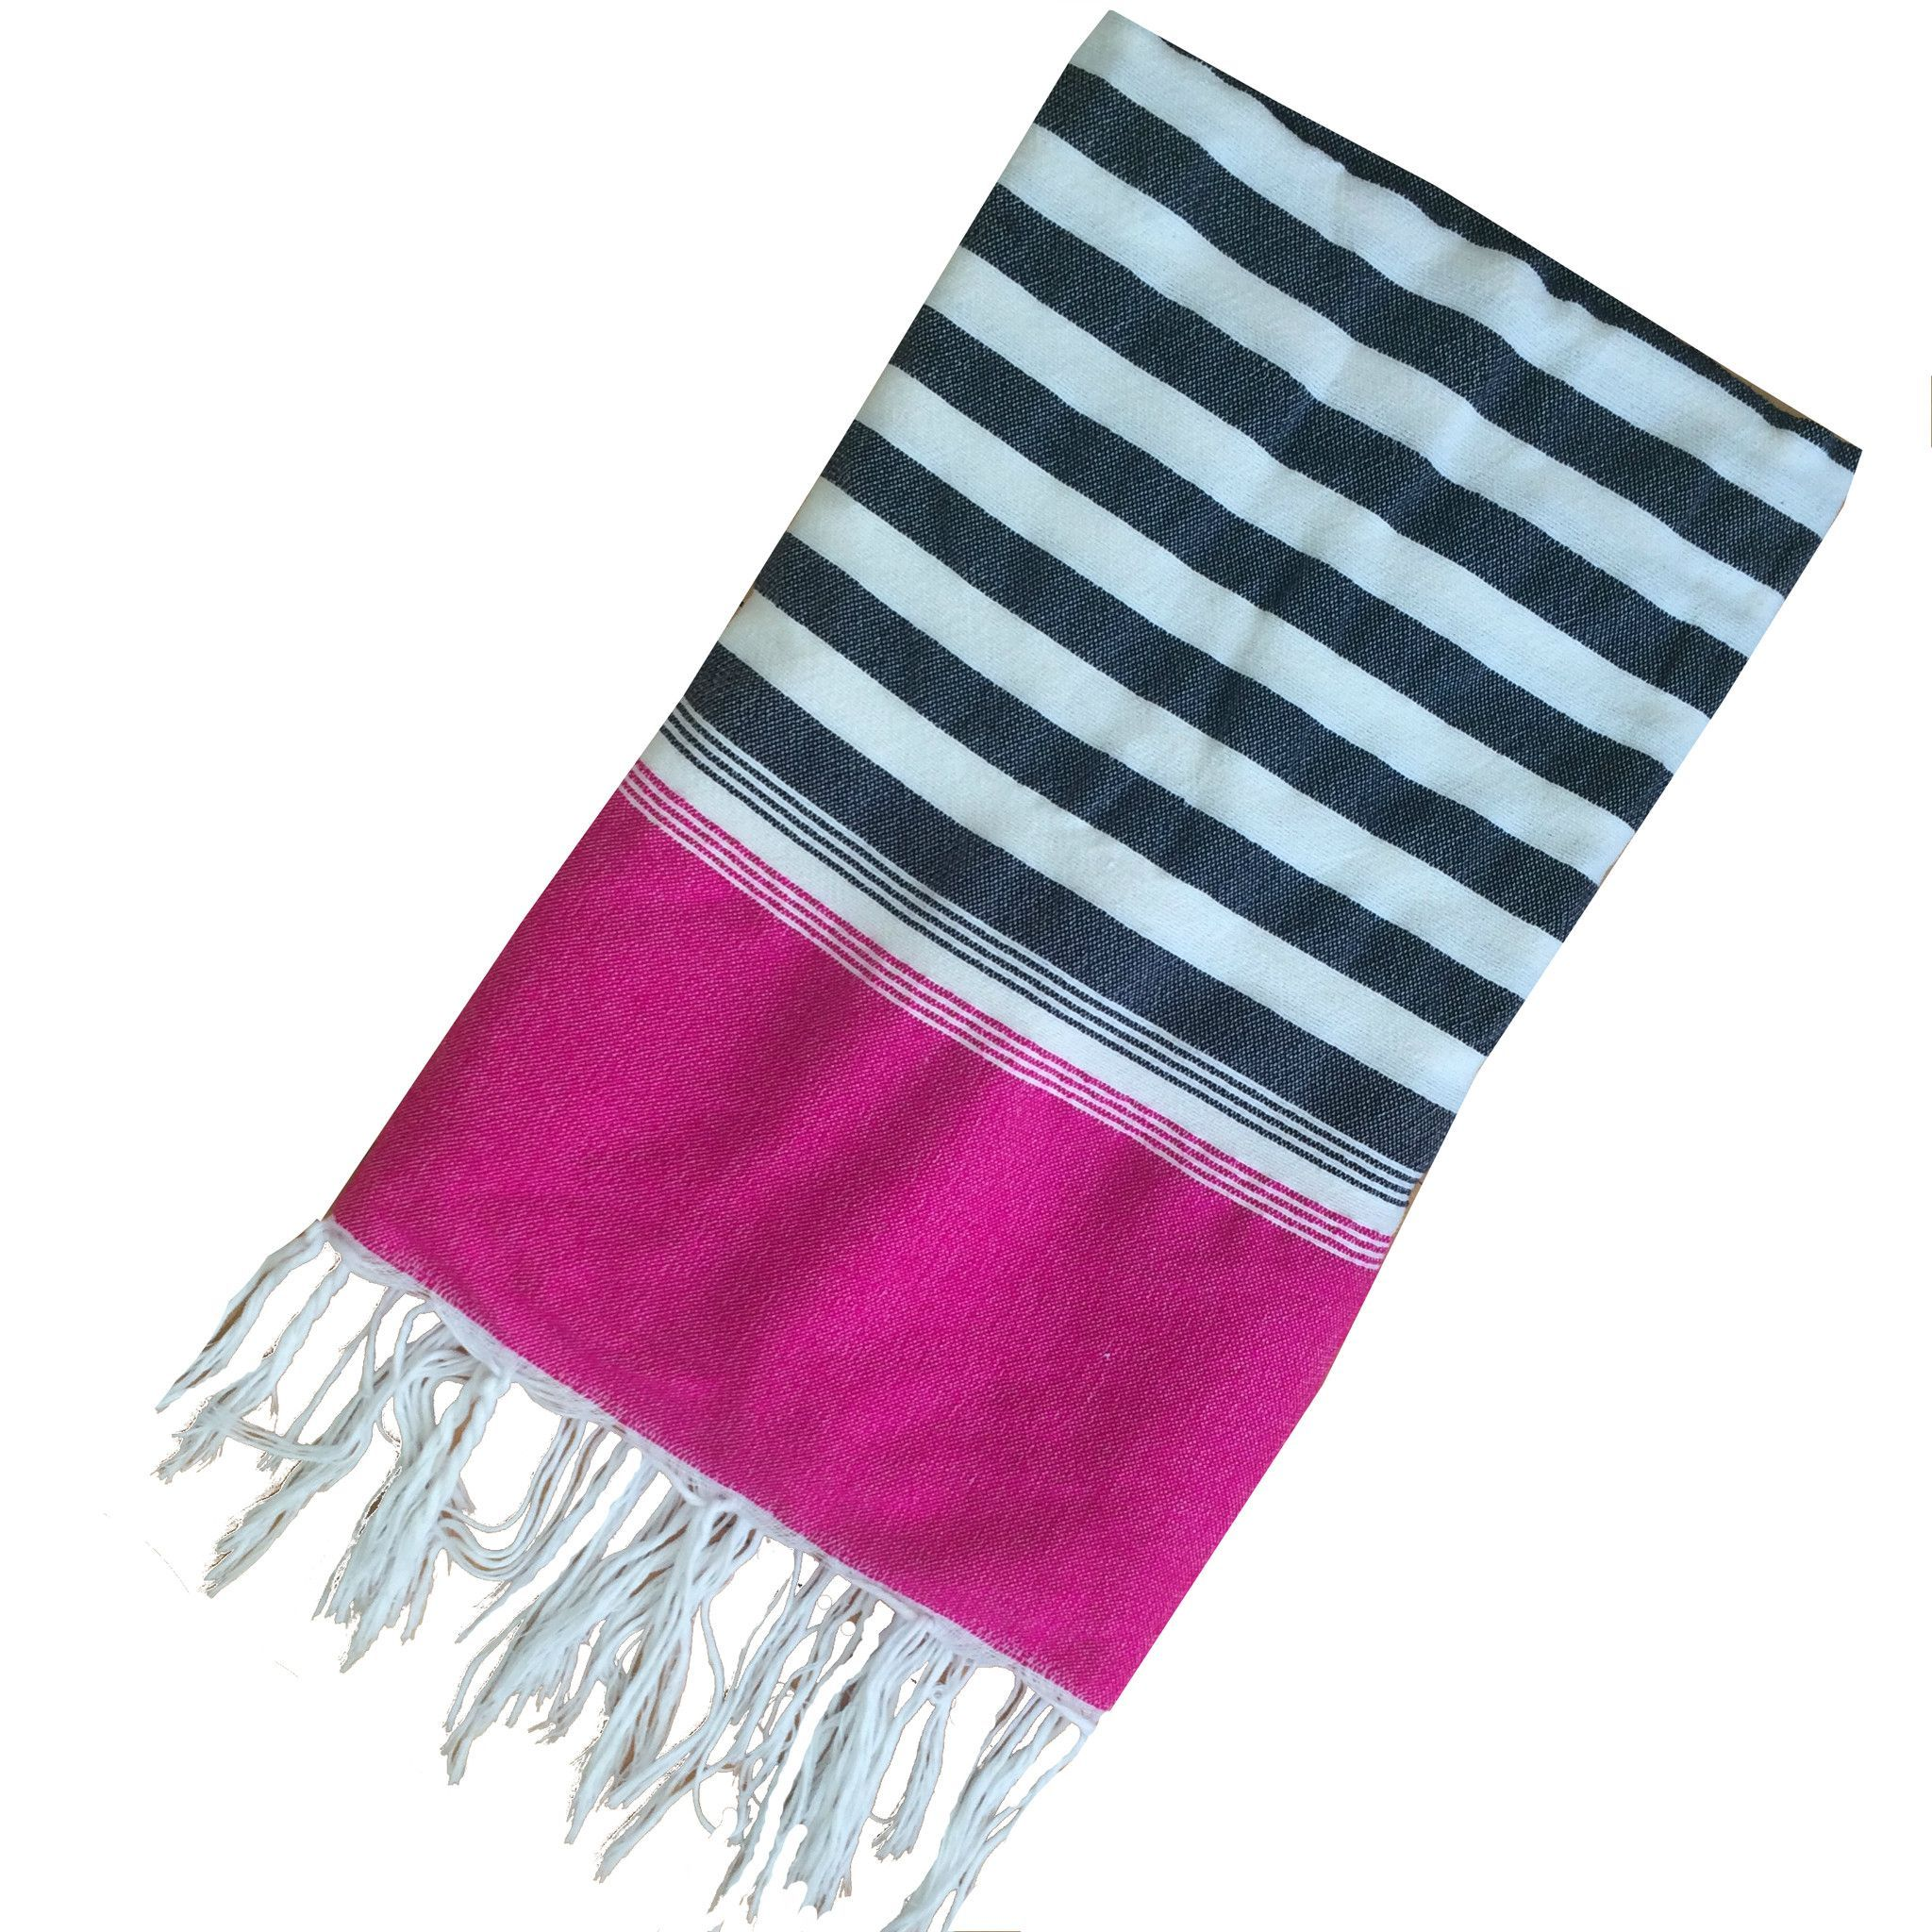 Hammam towel hammam towels hammam neon pink